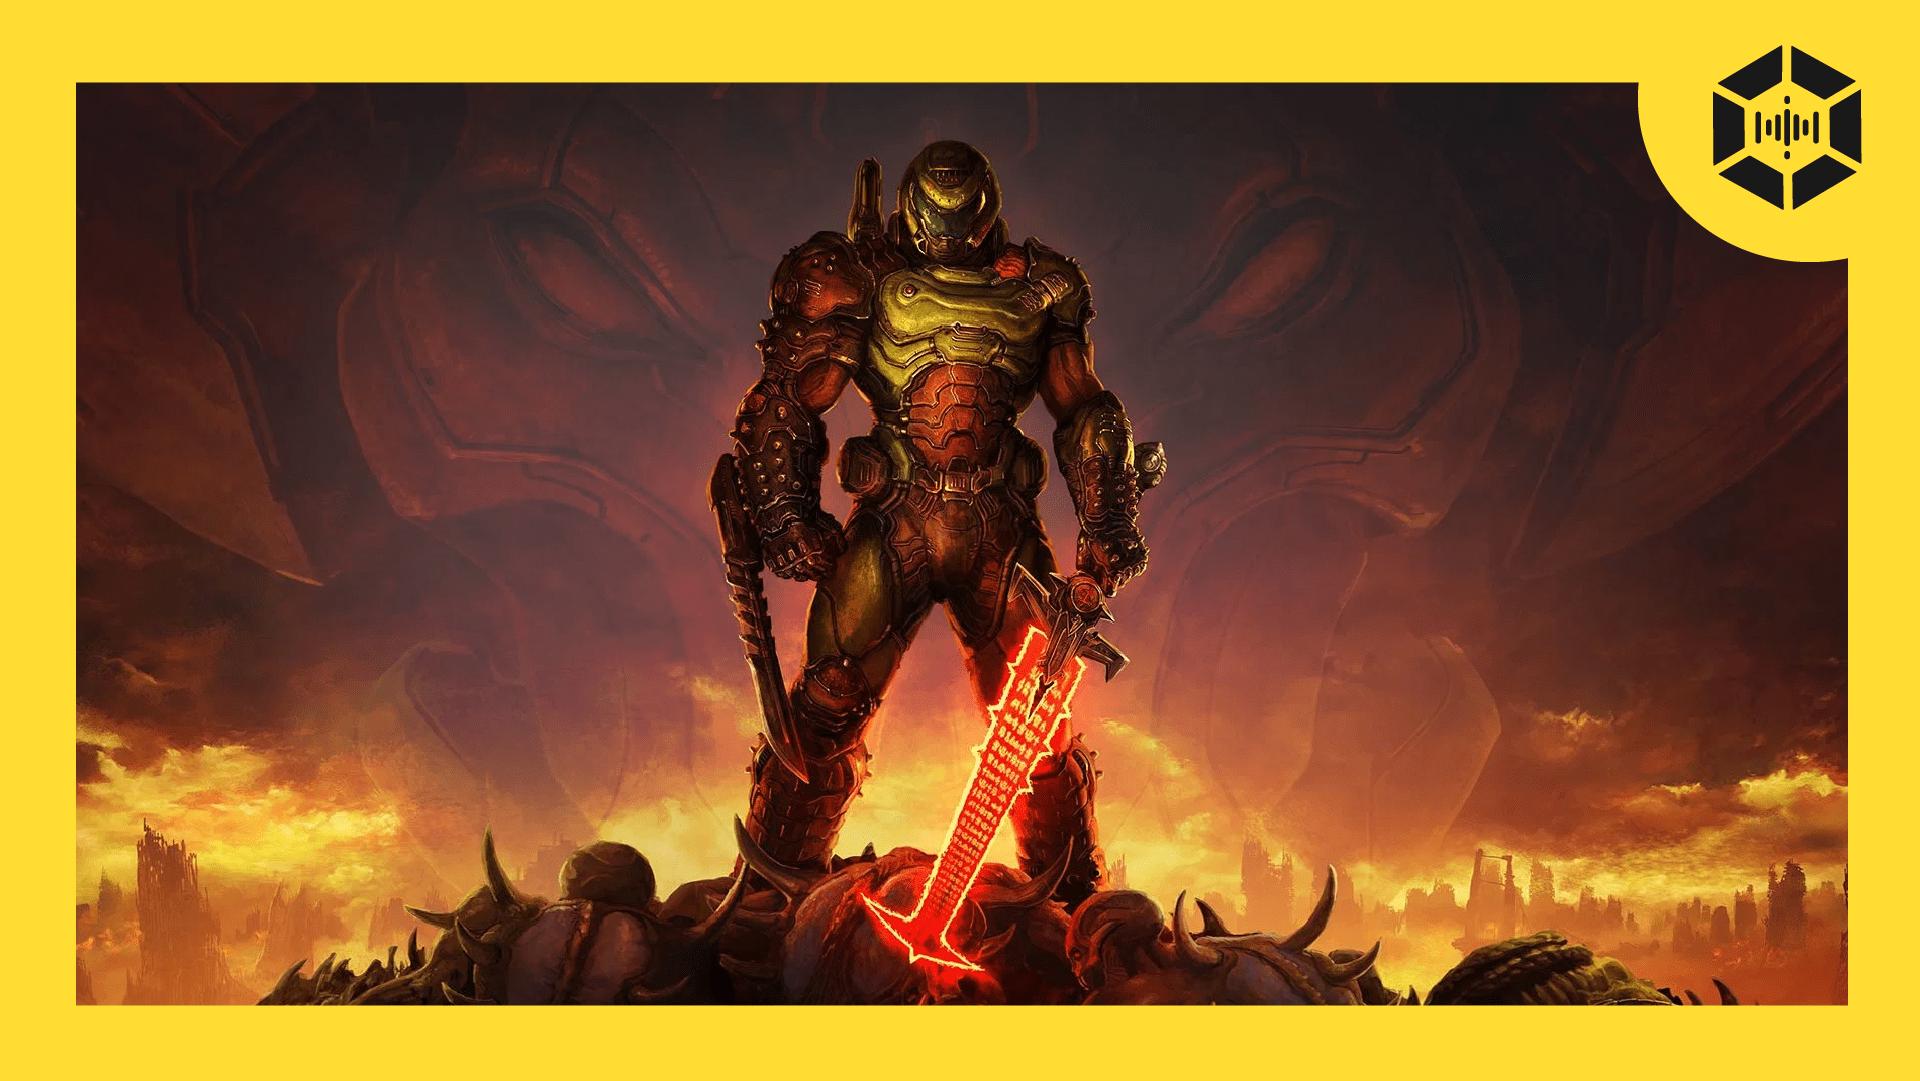 Doom guy from Doom Eternal in game art, holding a sword framed by yellow podcast logo